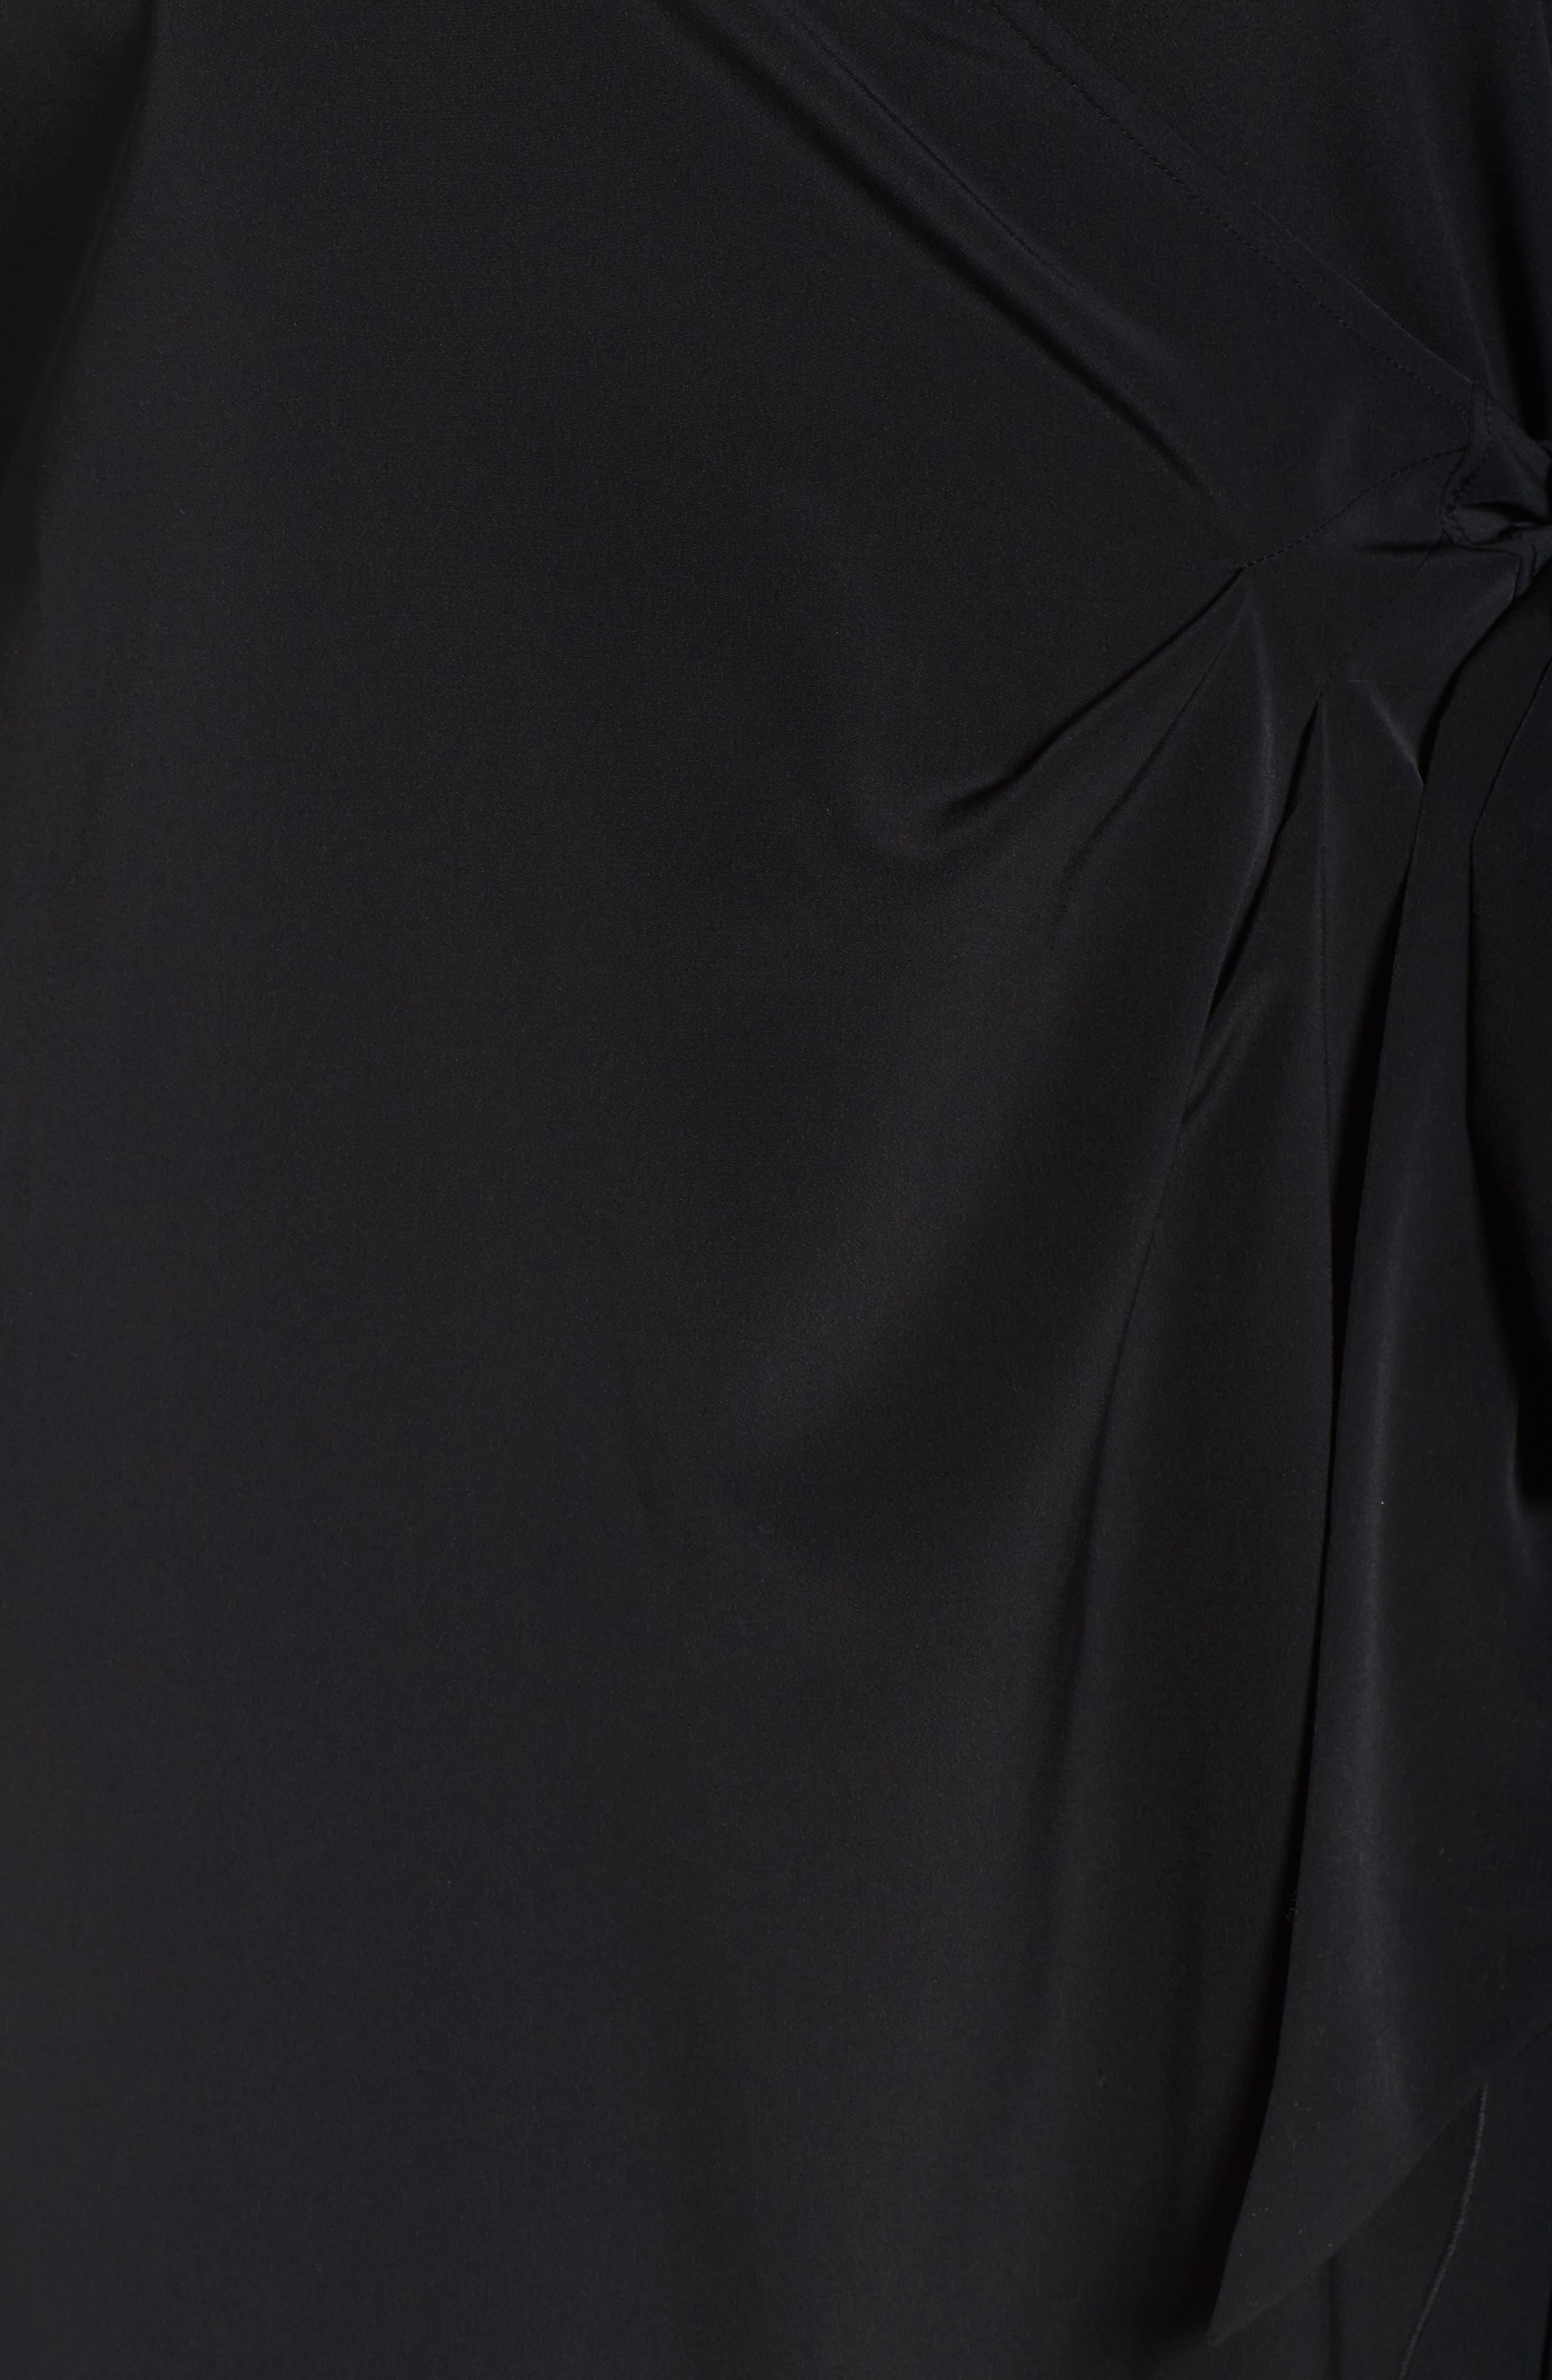 Wrap Dress,                             Alternate thumbnail 5, color,                             001